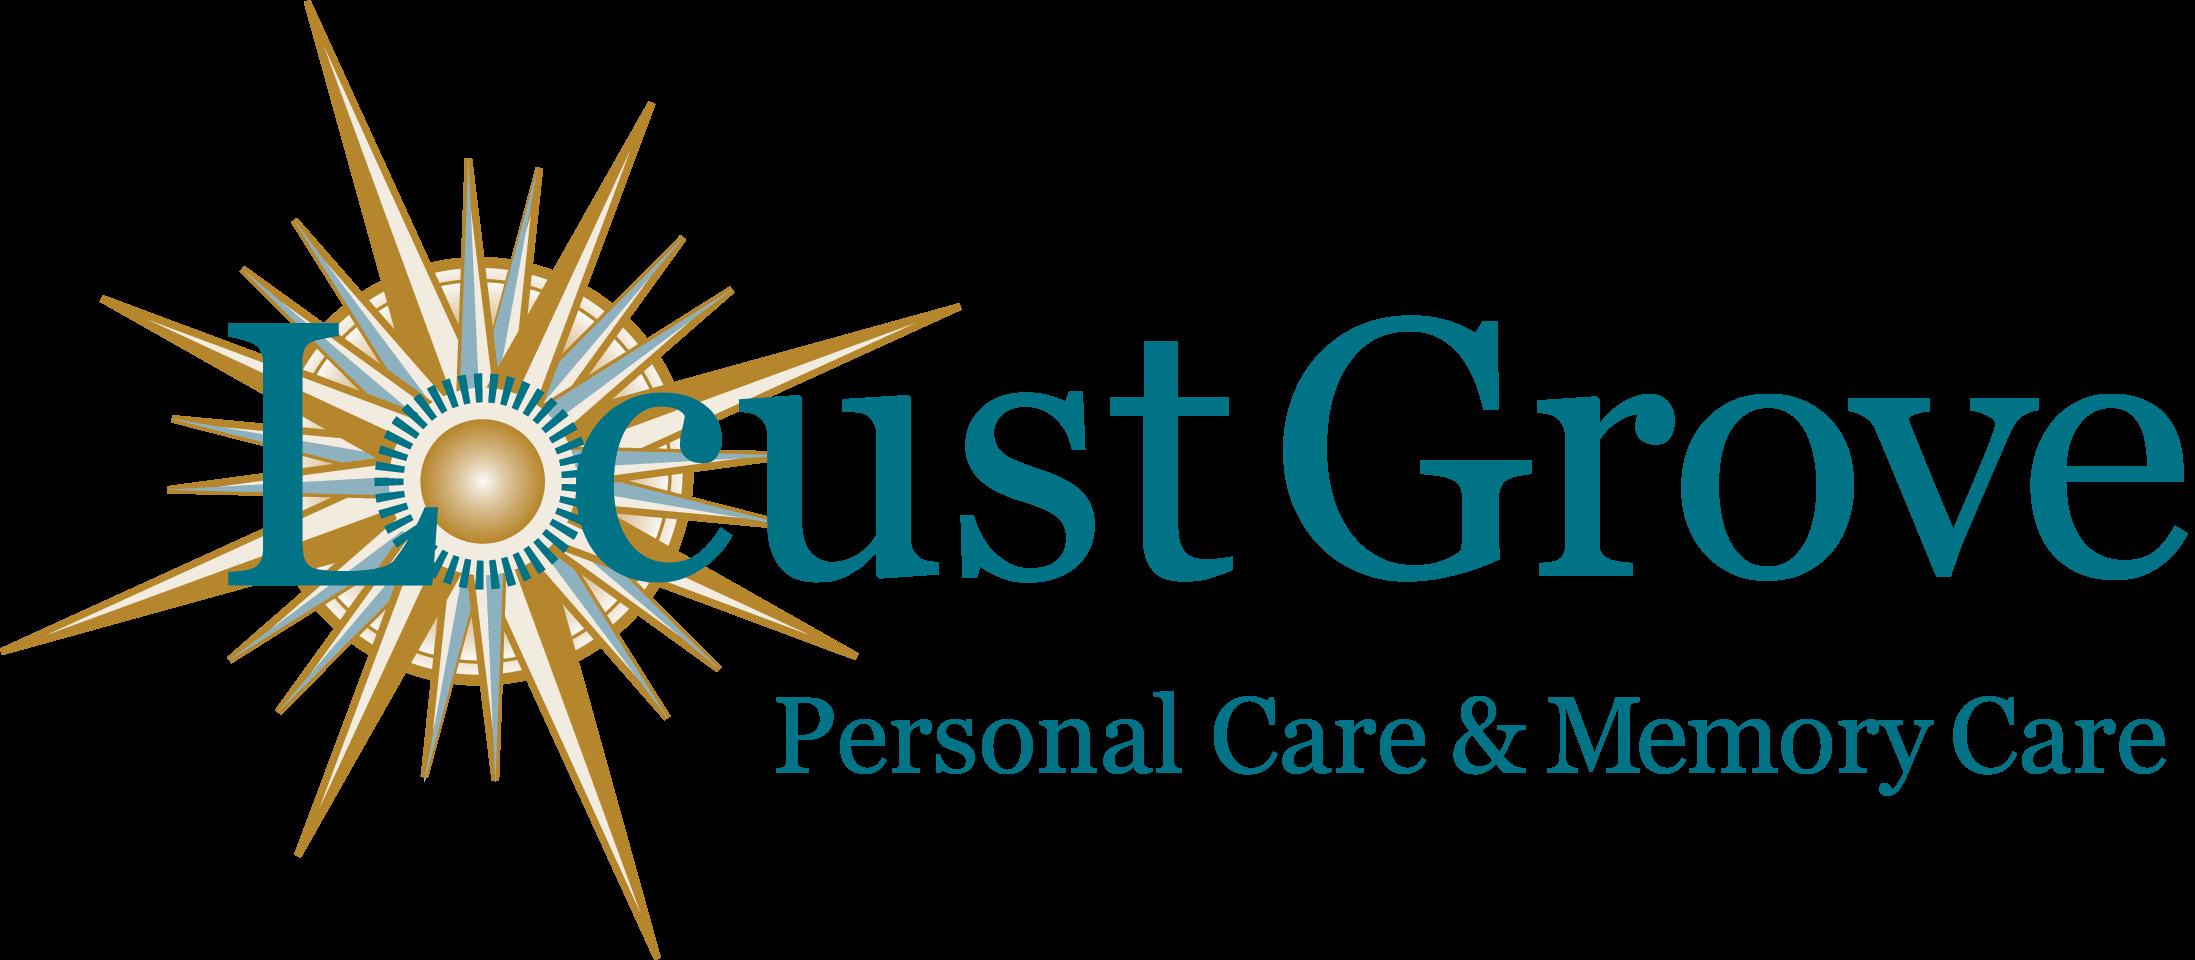 Locust Grove Personal Care & Memory Care